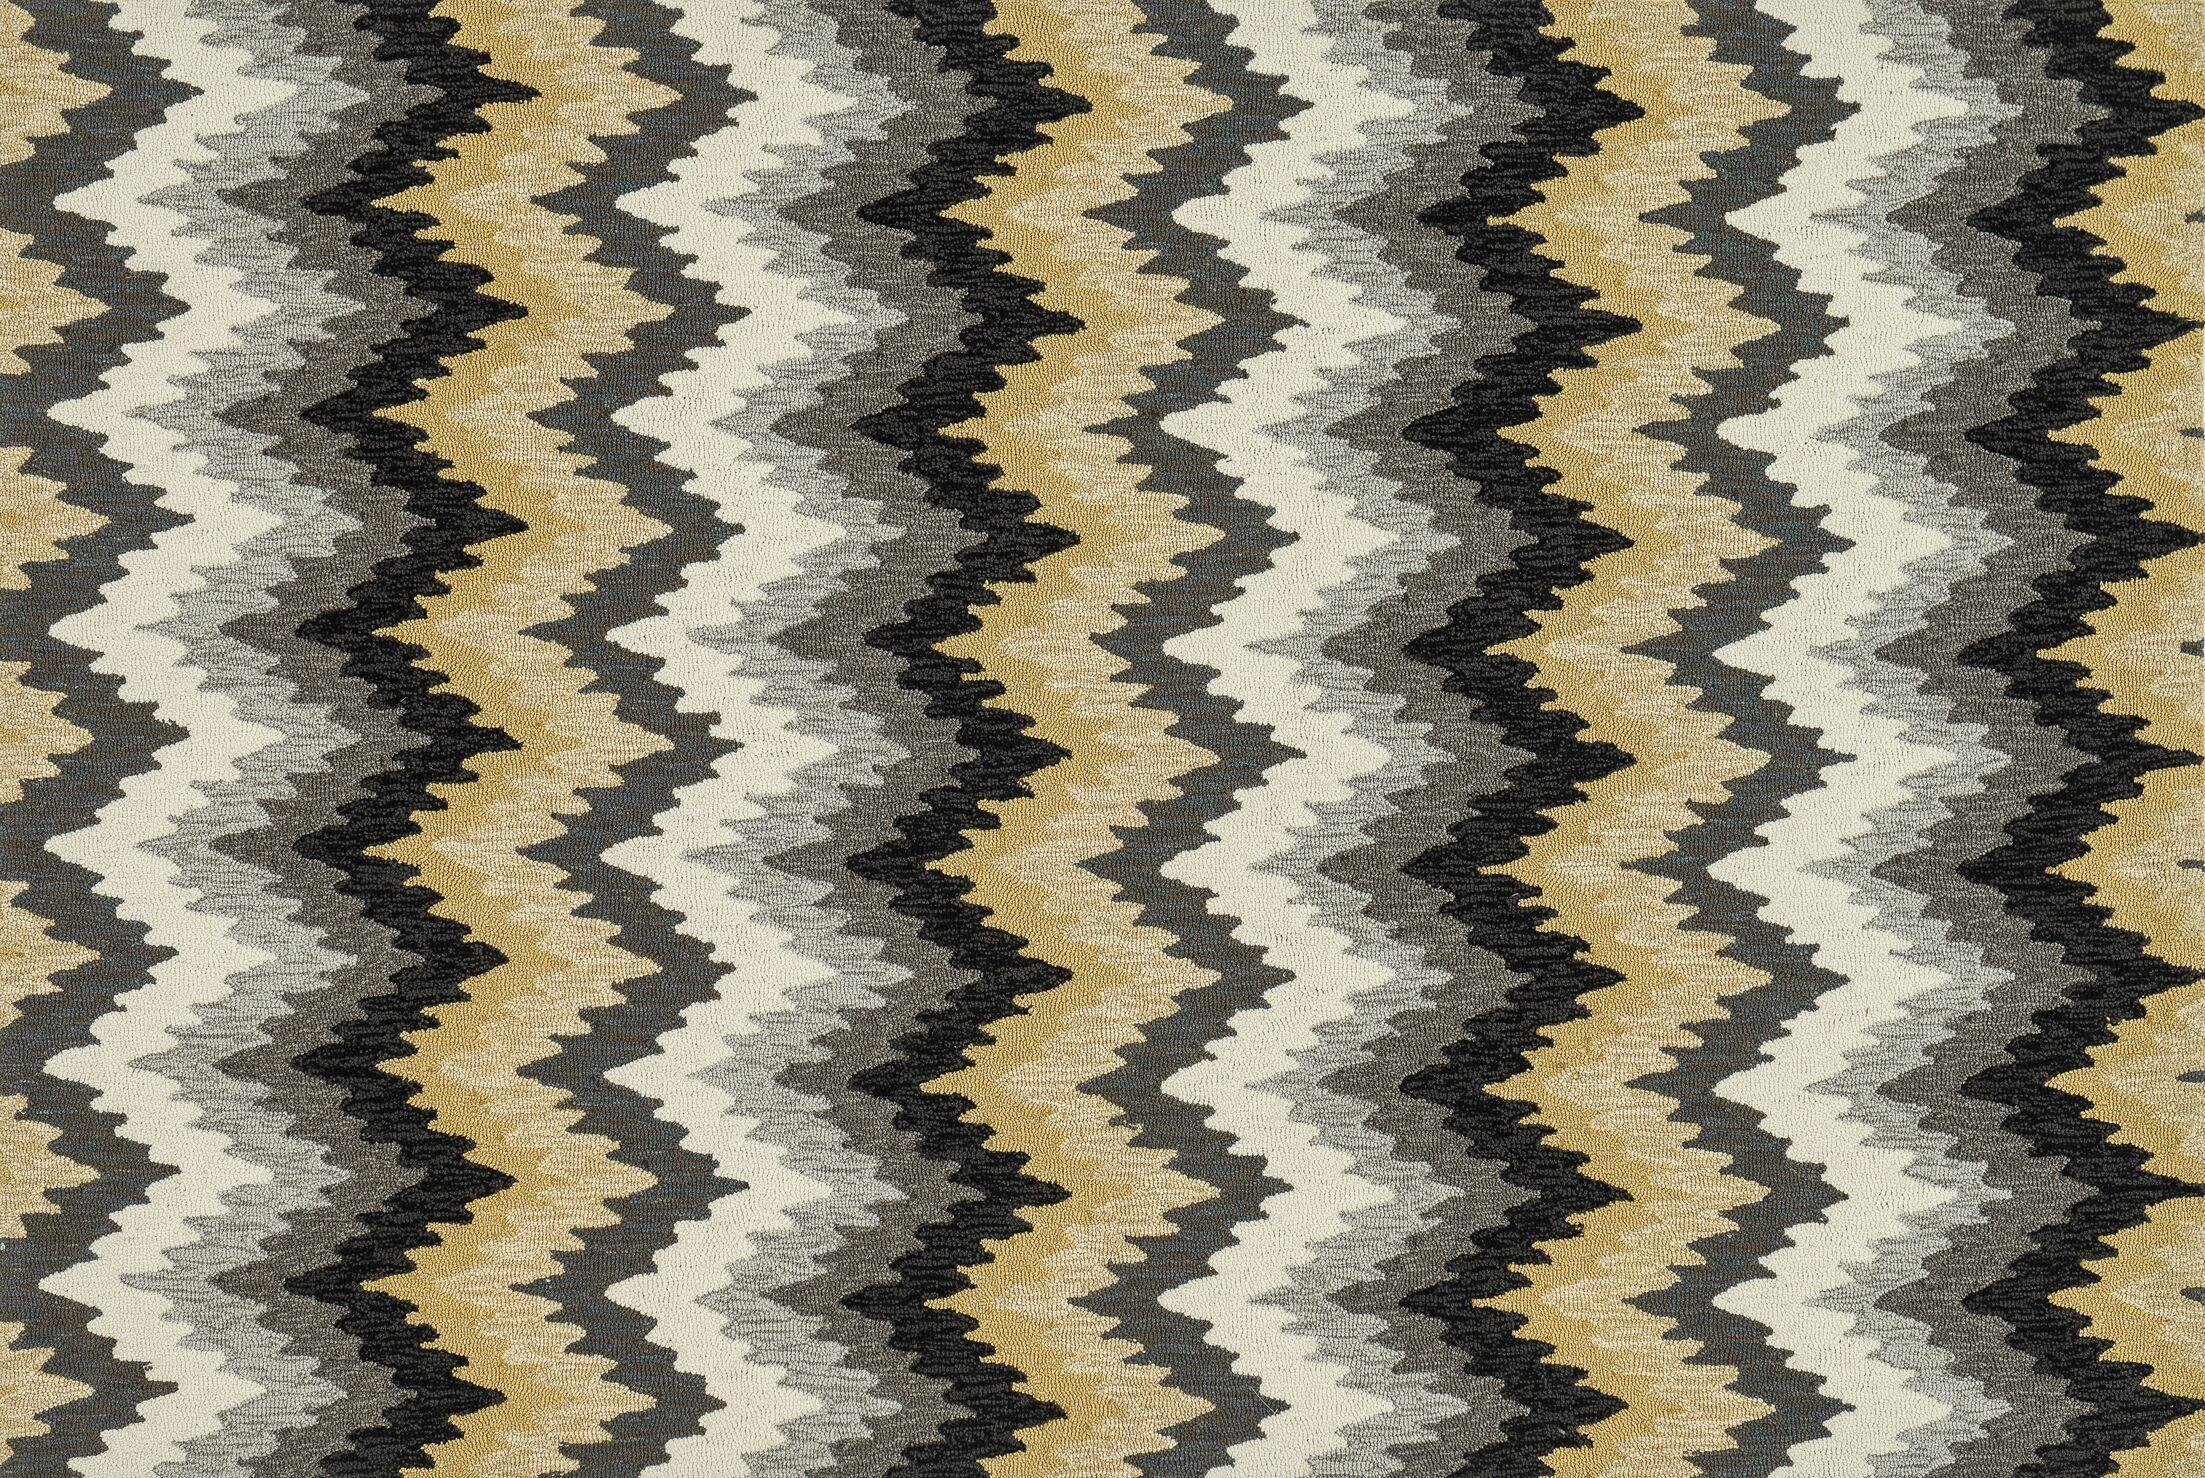 Danis Hand-Hooked Black/Gray Area Rug Rug Size: Rectangle 5' x 7'6